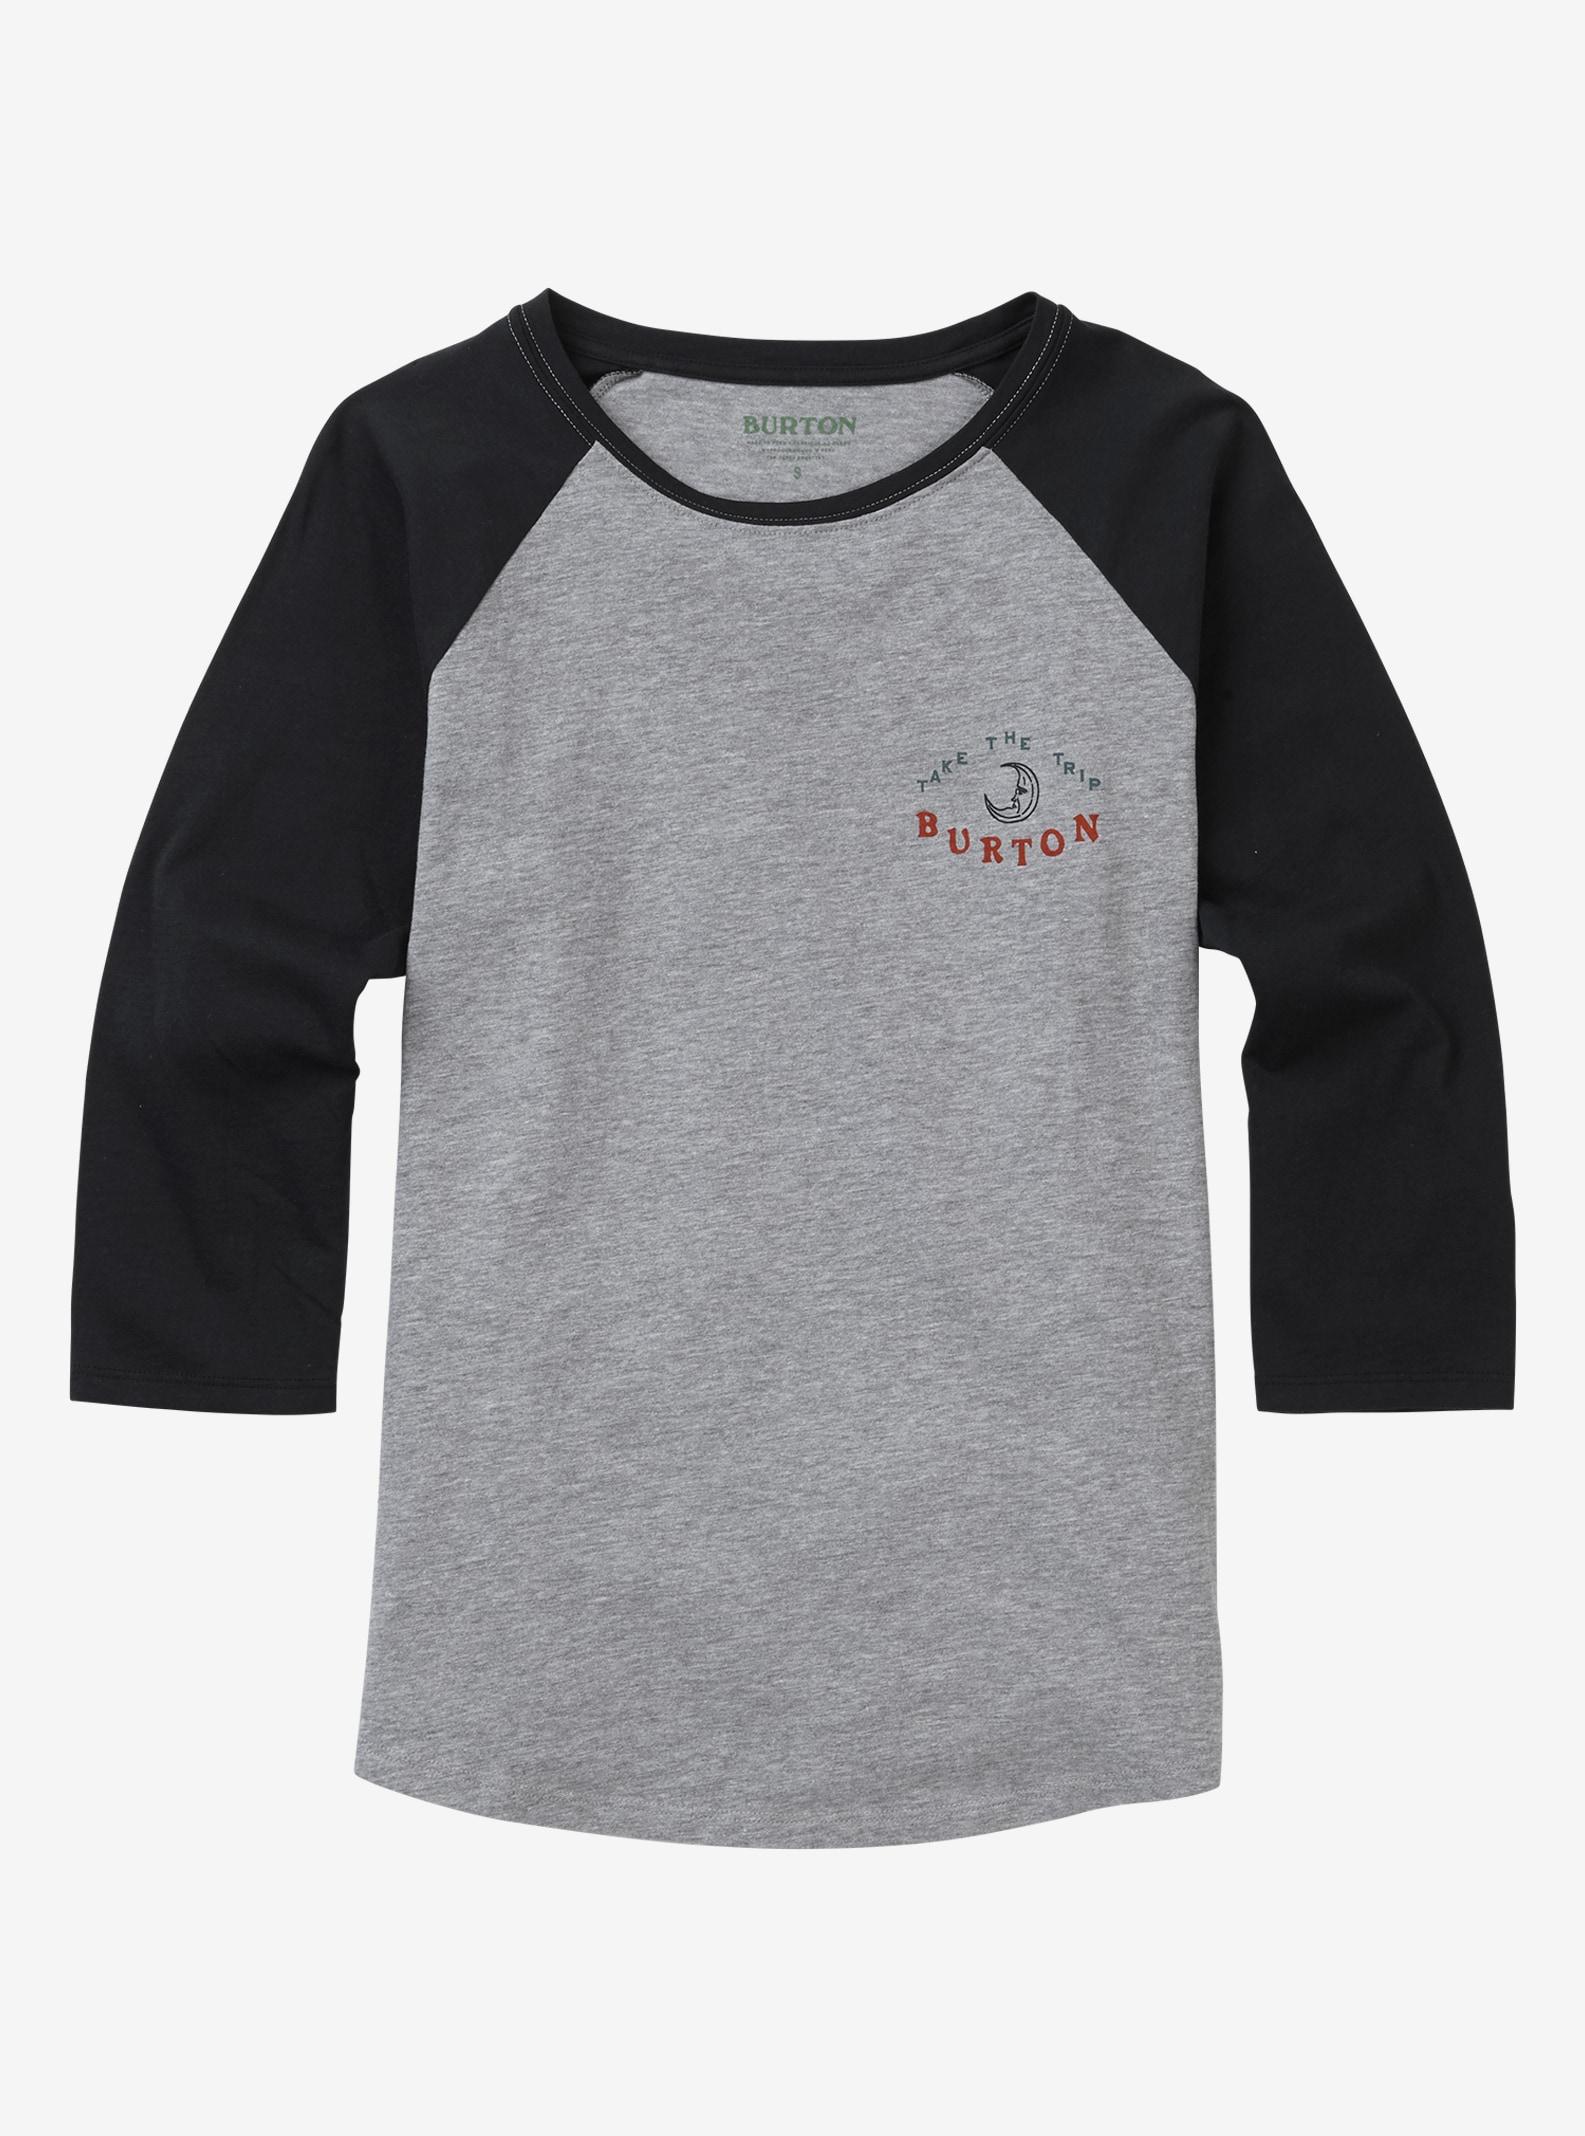 Caratunk Raglan T-Shirt LS canvas Burton 5hgkv1ys